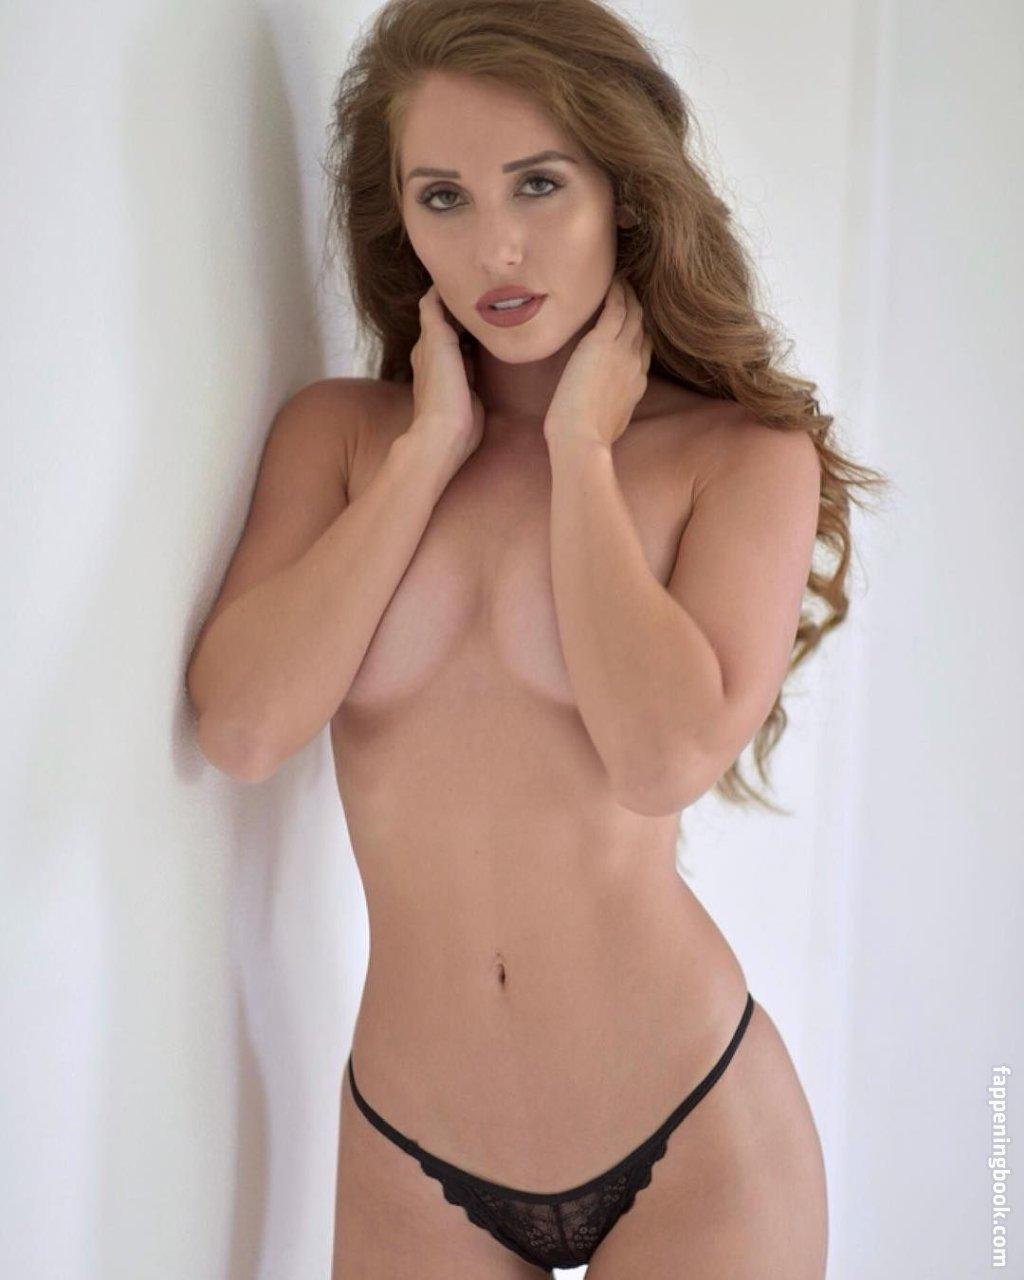 Lori nude melissa Playboy Cybergirl